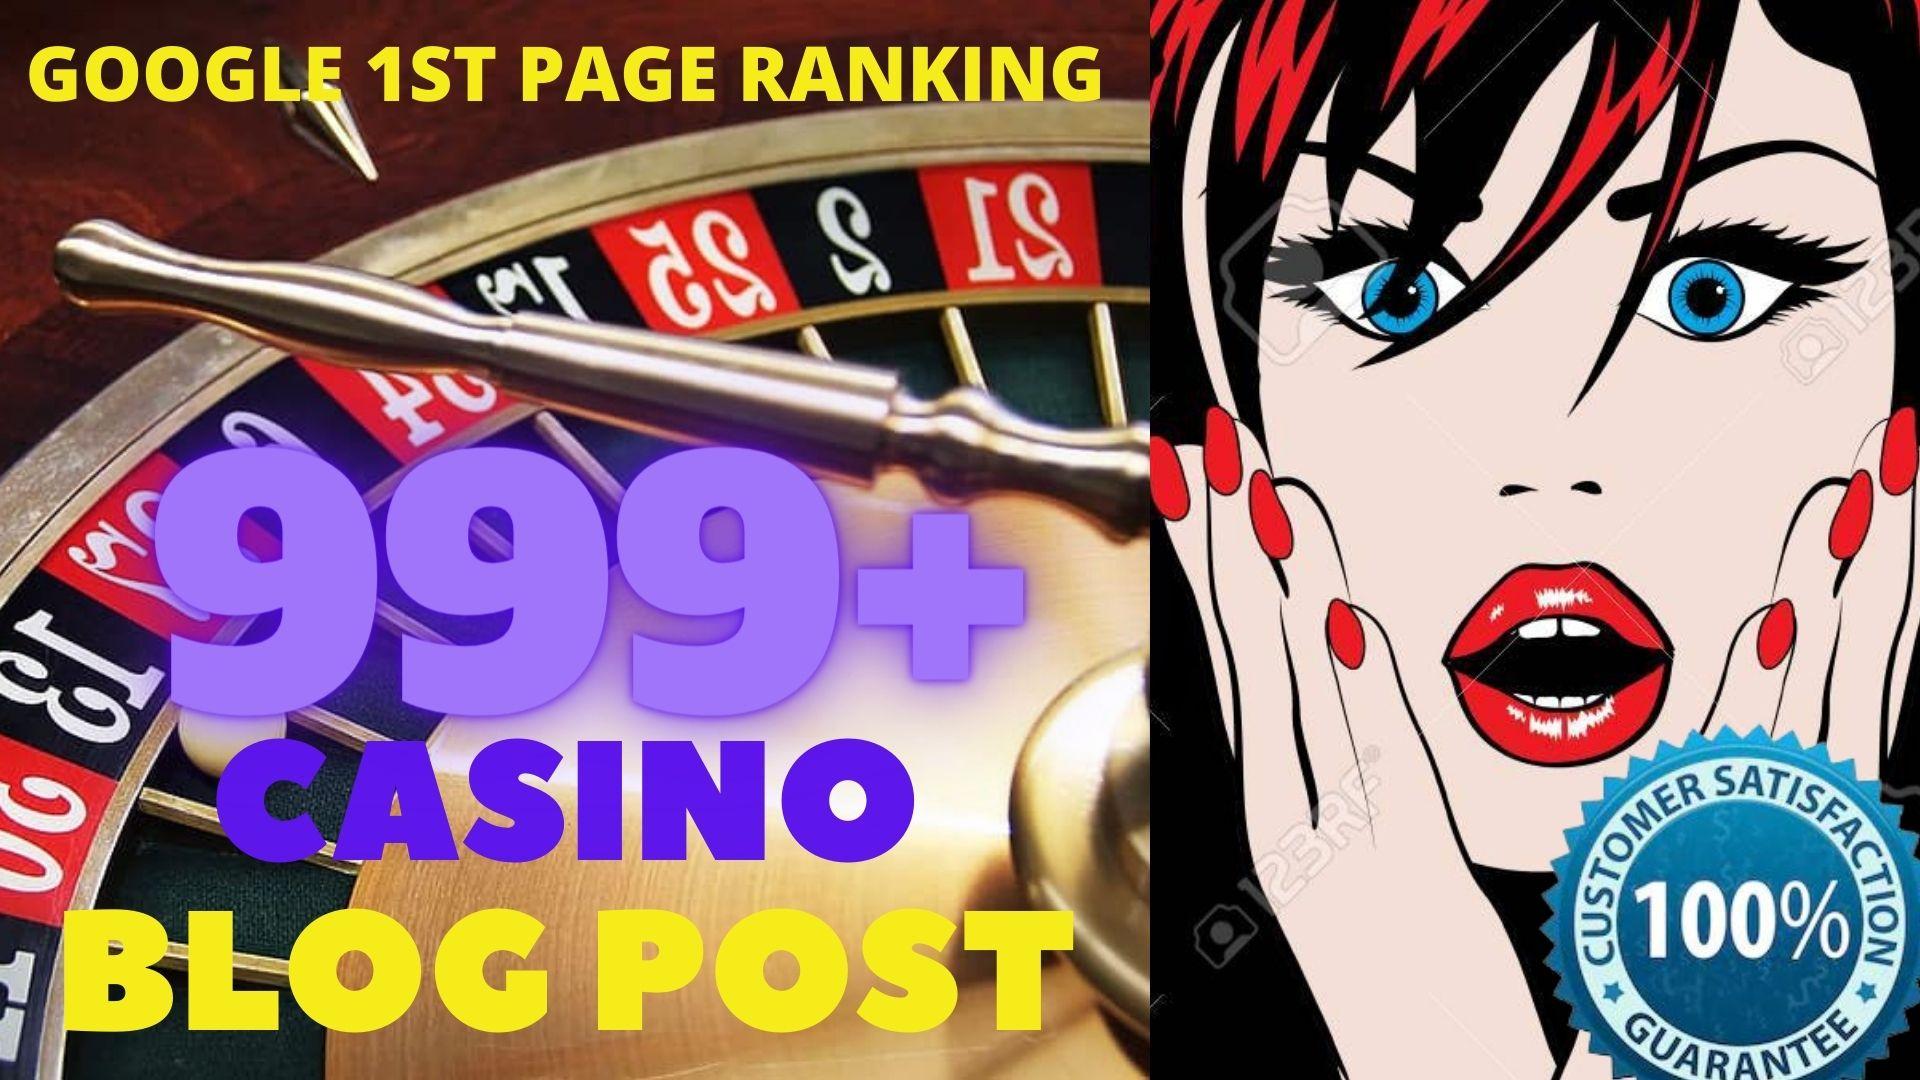 I WILL DO 999 CASINO/POKER/Gambling/Sports Betting/judi bola Pbn Backlinks online casino unique site